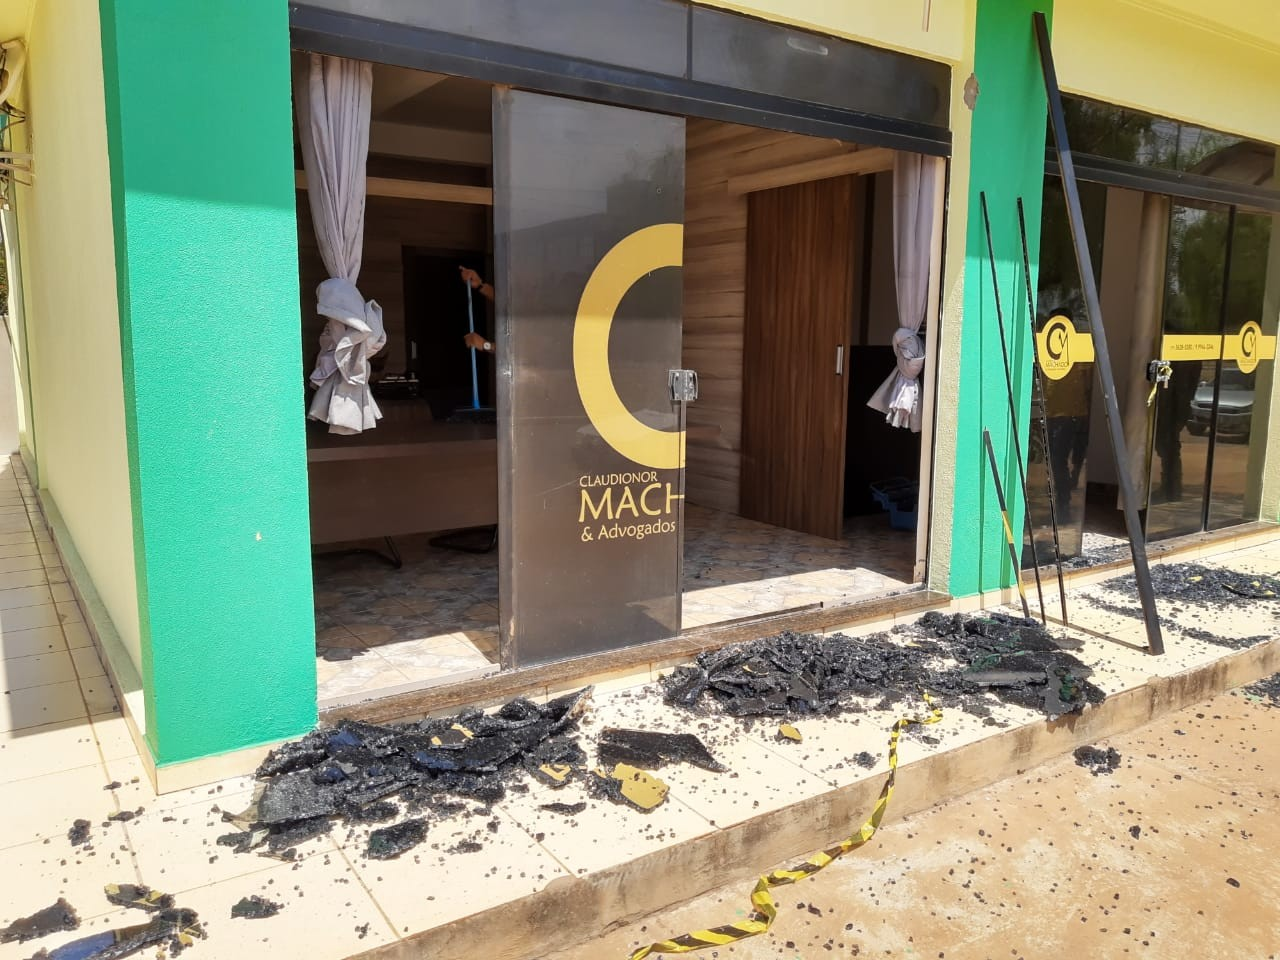 Escritório de advogado e candidato a vereador é alvo de tiros no oeste da Bahia